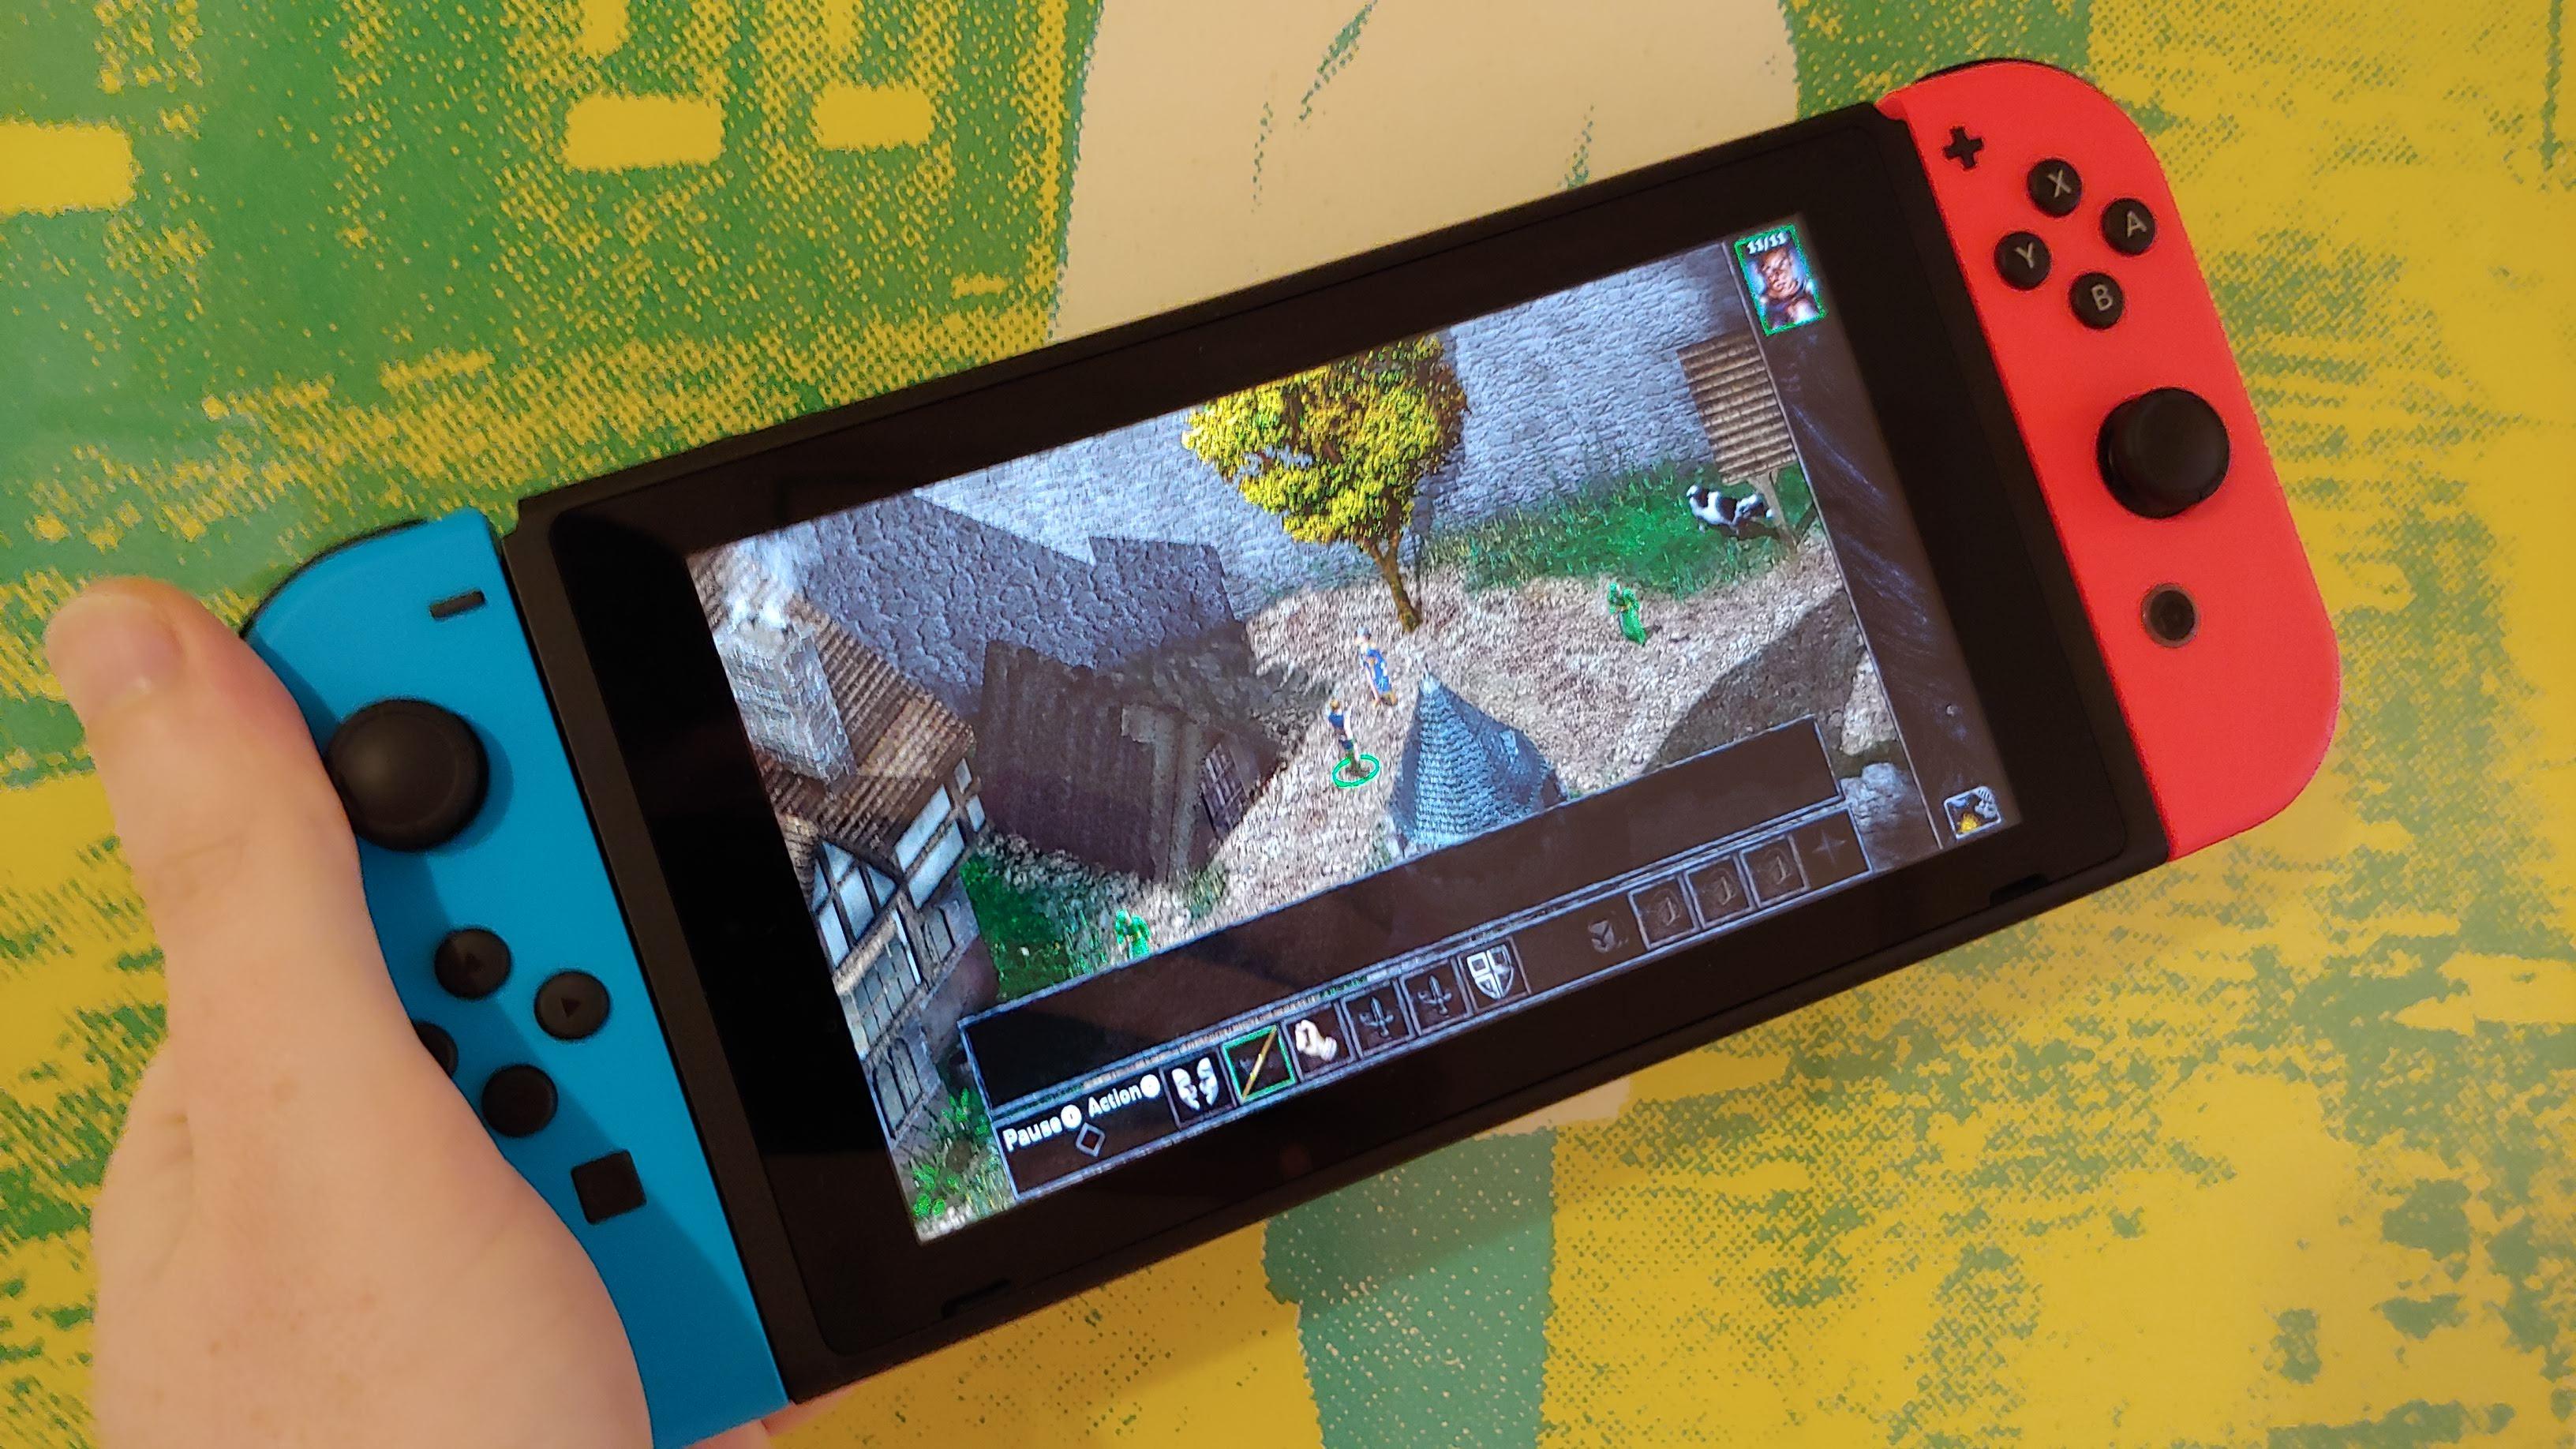 Baldur S Gate For Nintendo Switch Is A Dungeon Master Crpg